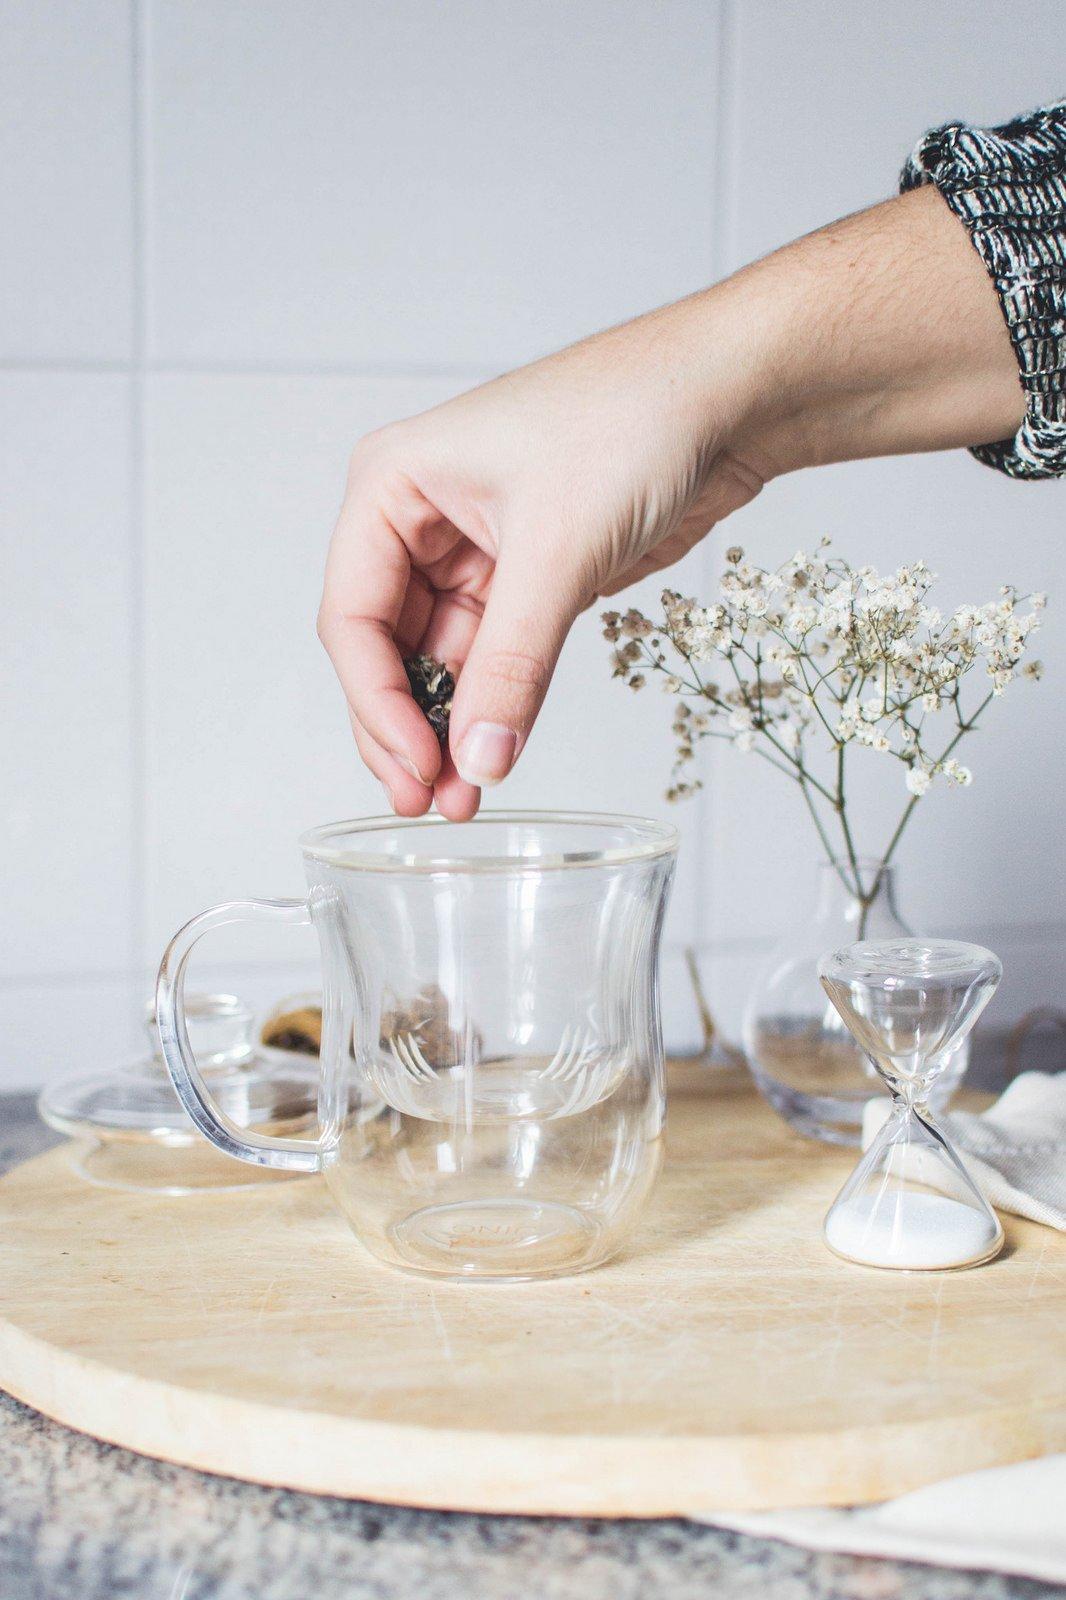 Making Tea in the JING Infuser Mug